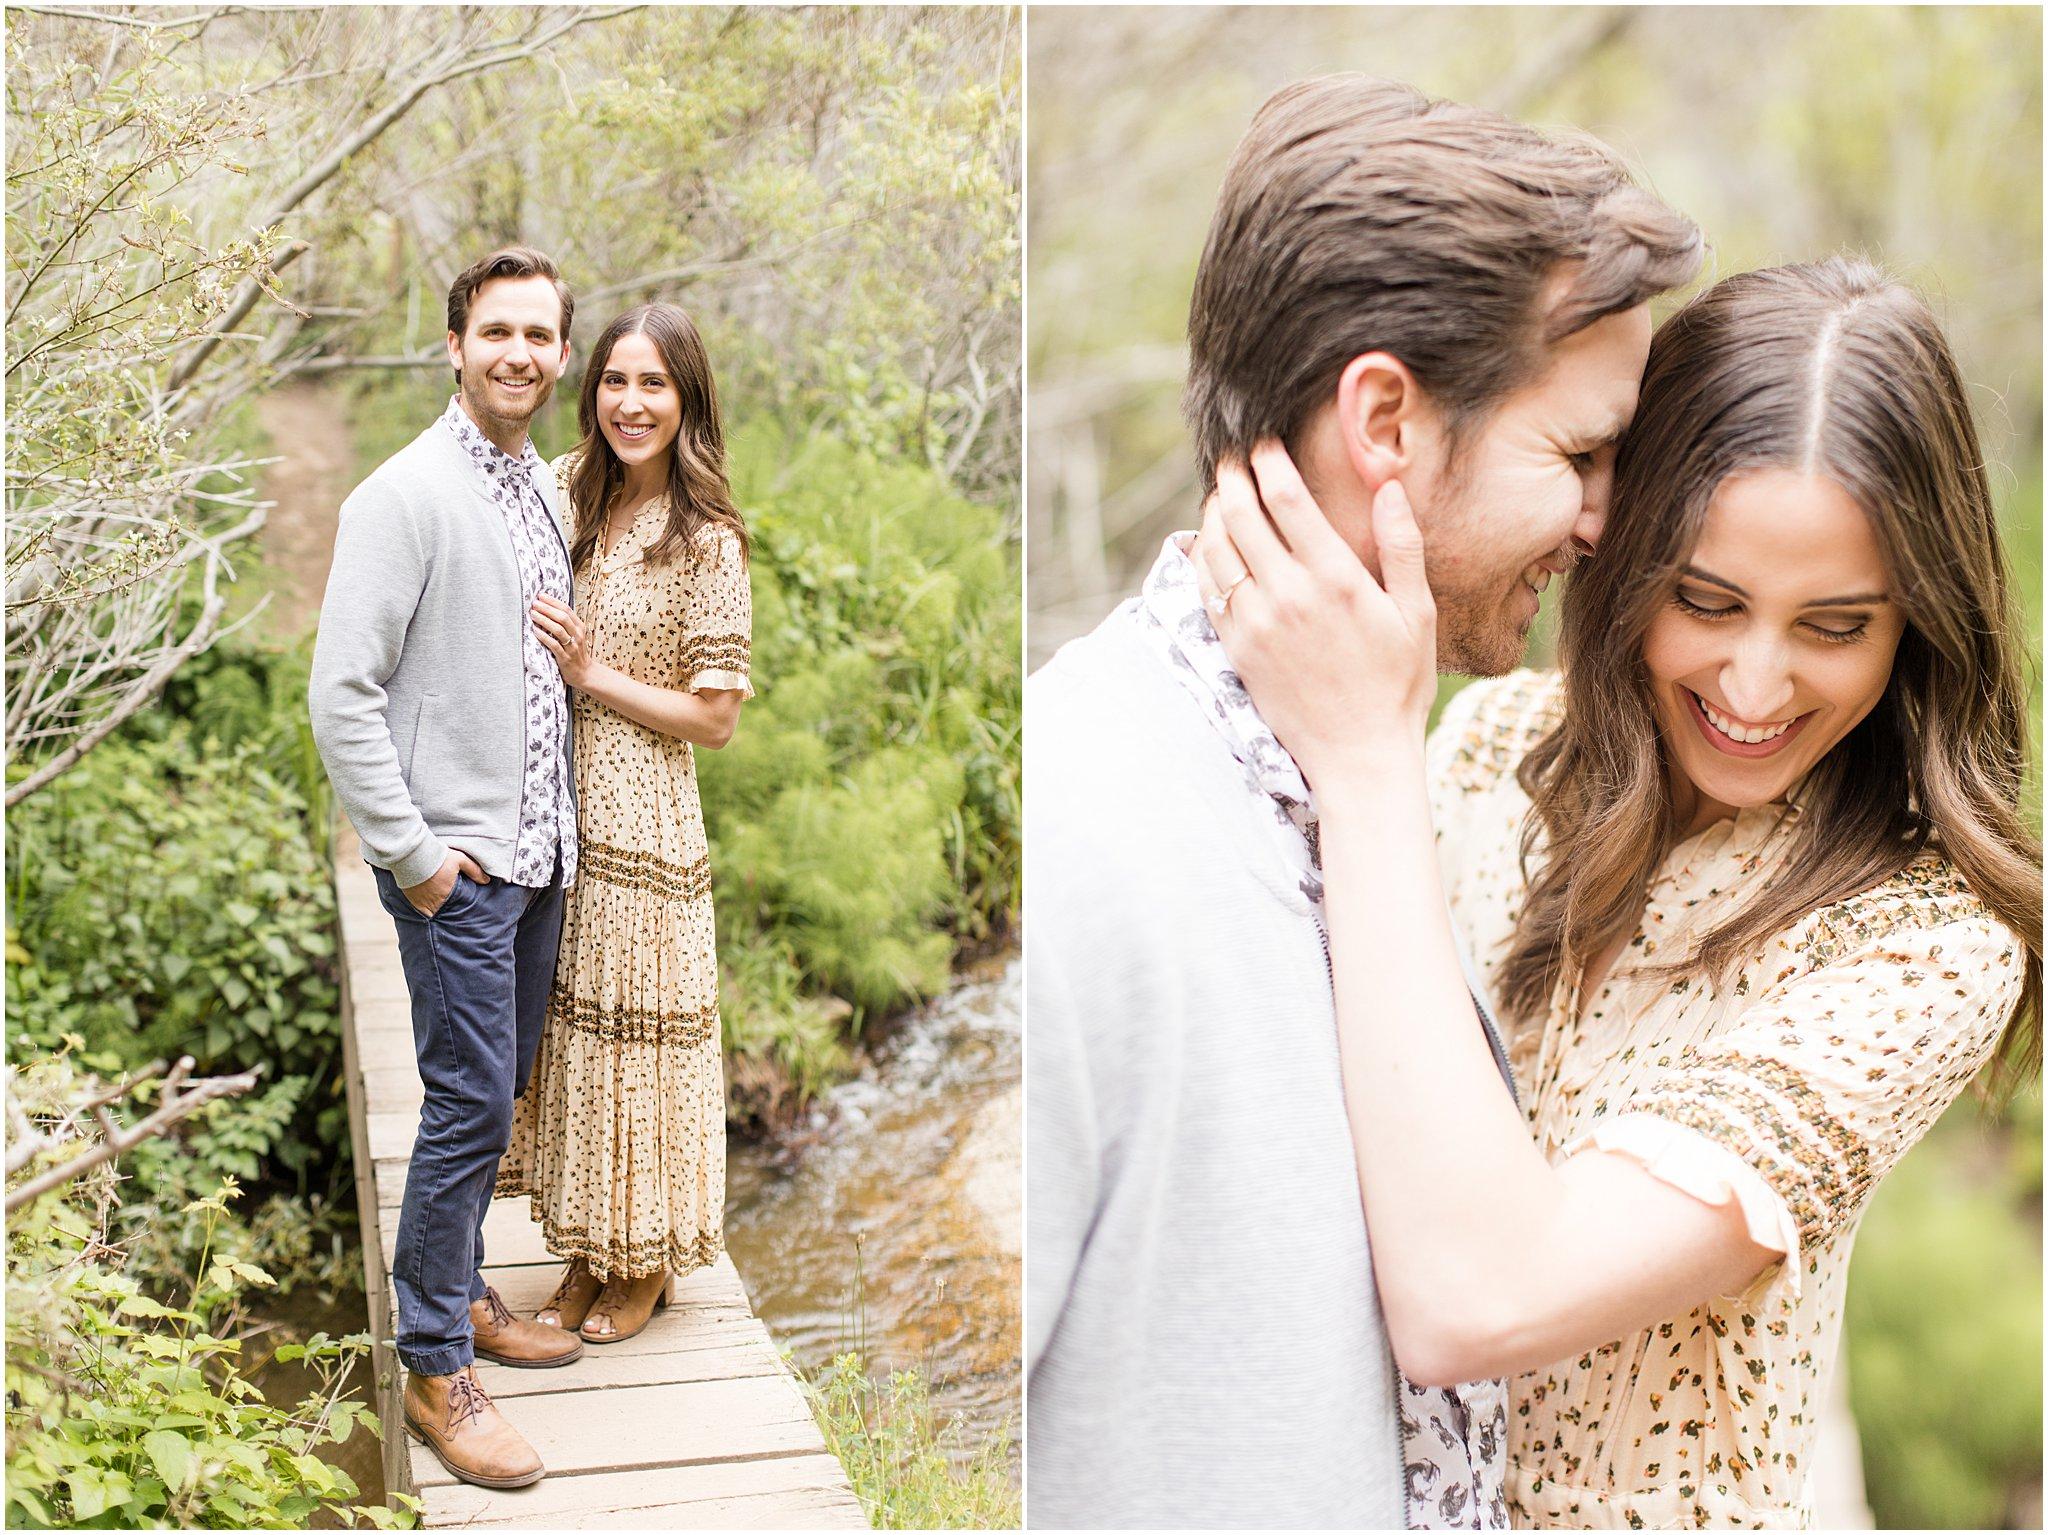 2019 carmel highlands garrapata state park couples portrait session bay area wedding photographer_0002.jpg